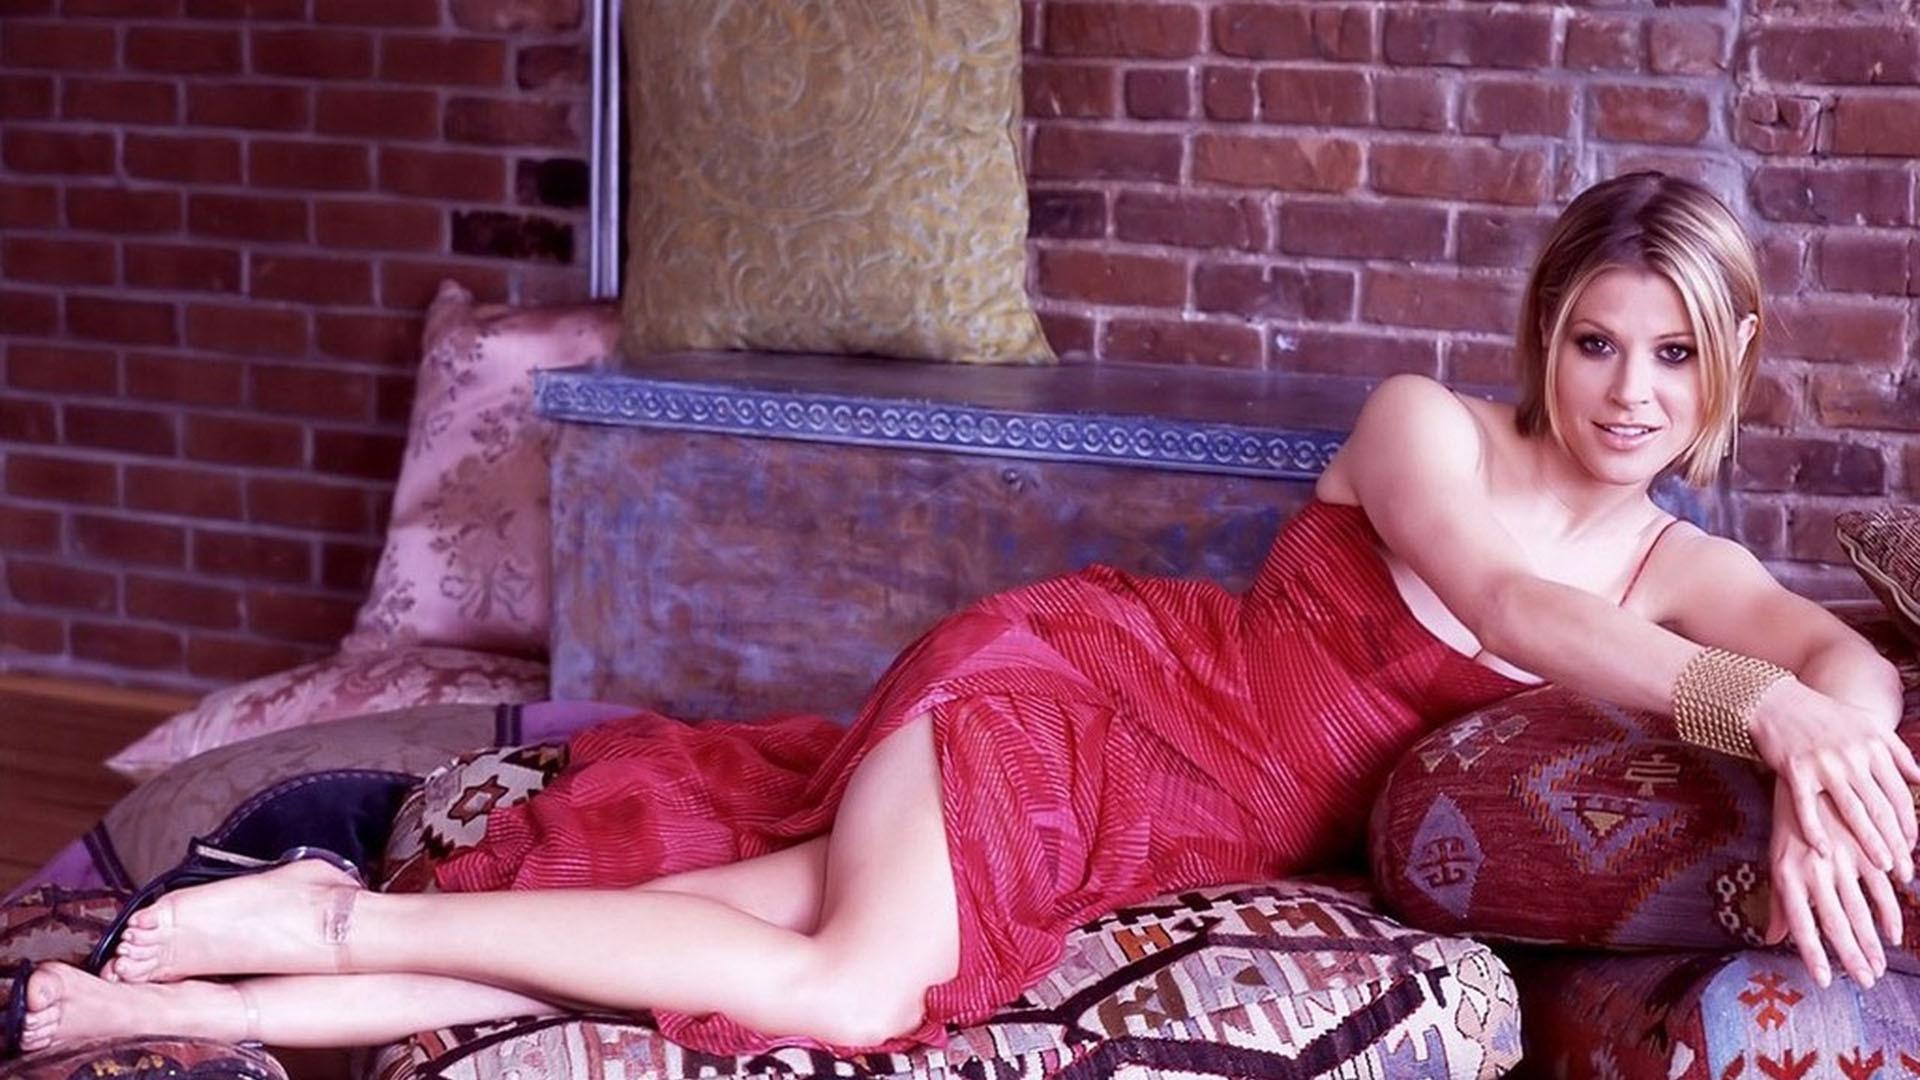 Julie Bowen High Quality Wallpapers